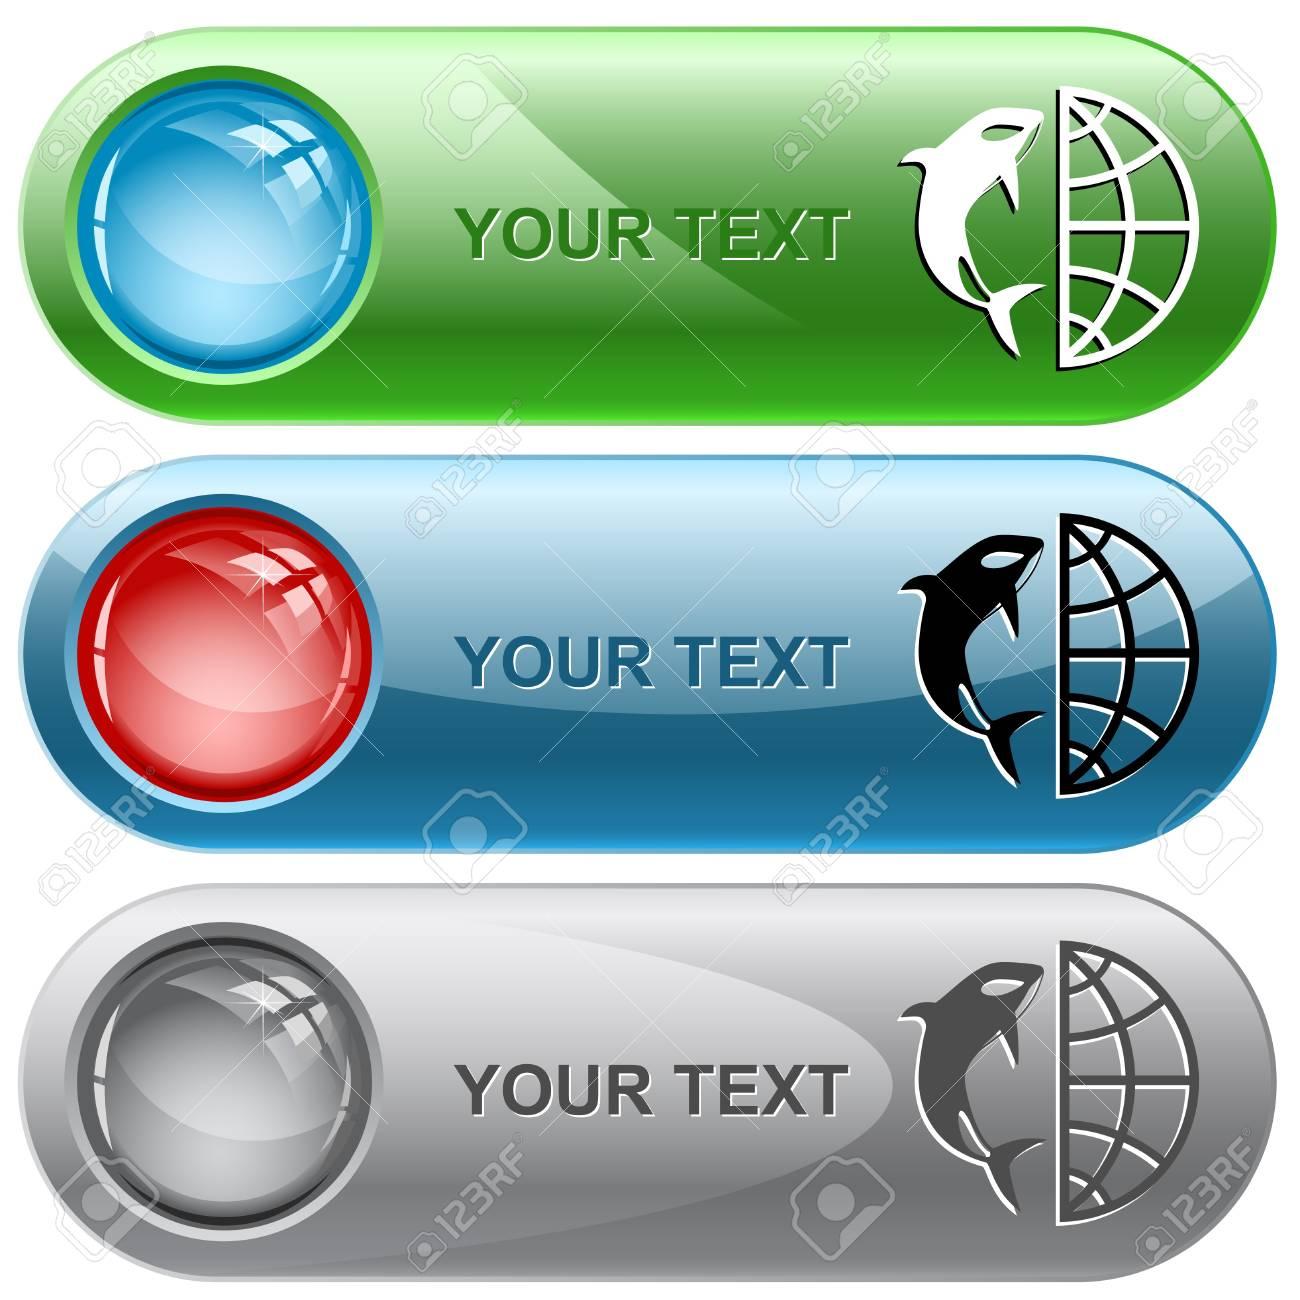 Globe and shamoo internet buttons. Stock Photo - 9603511